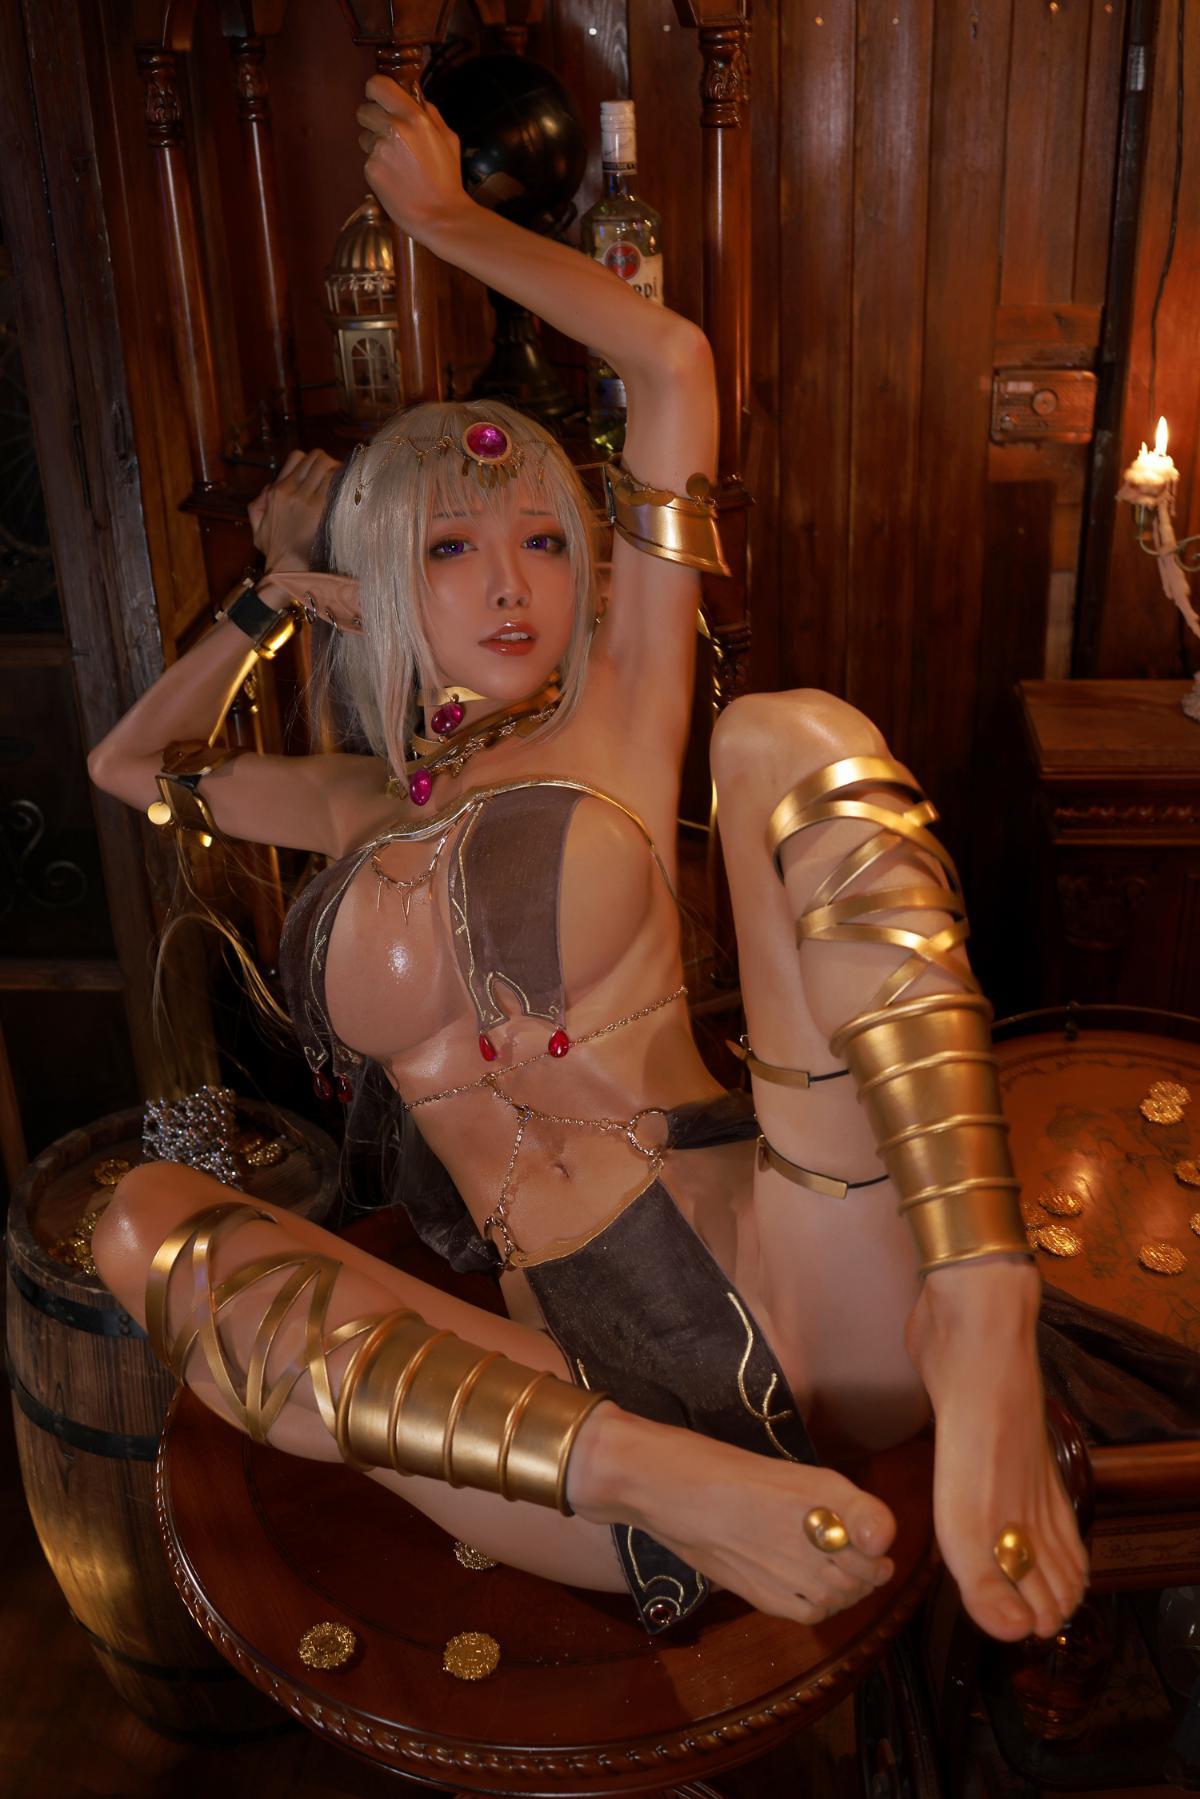 Tan Dancer Elf Succubus Cosplay by Aqua 29